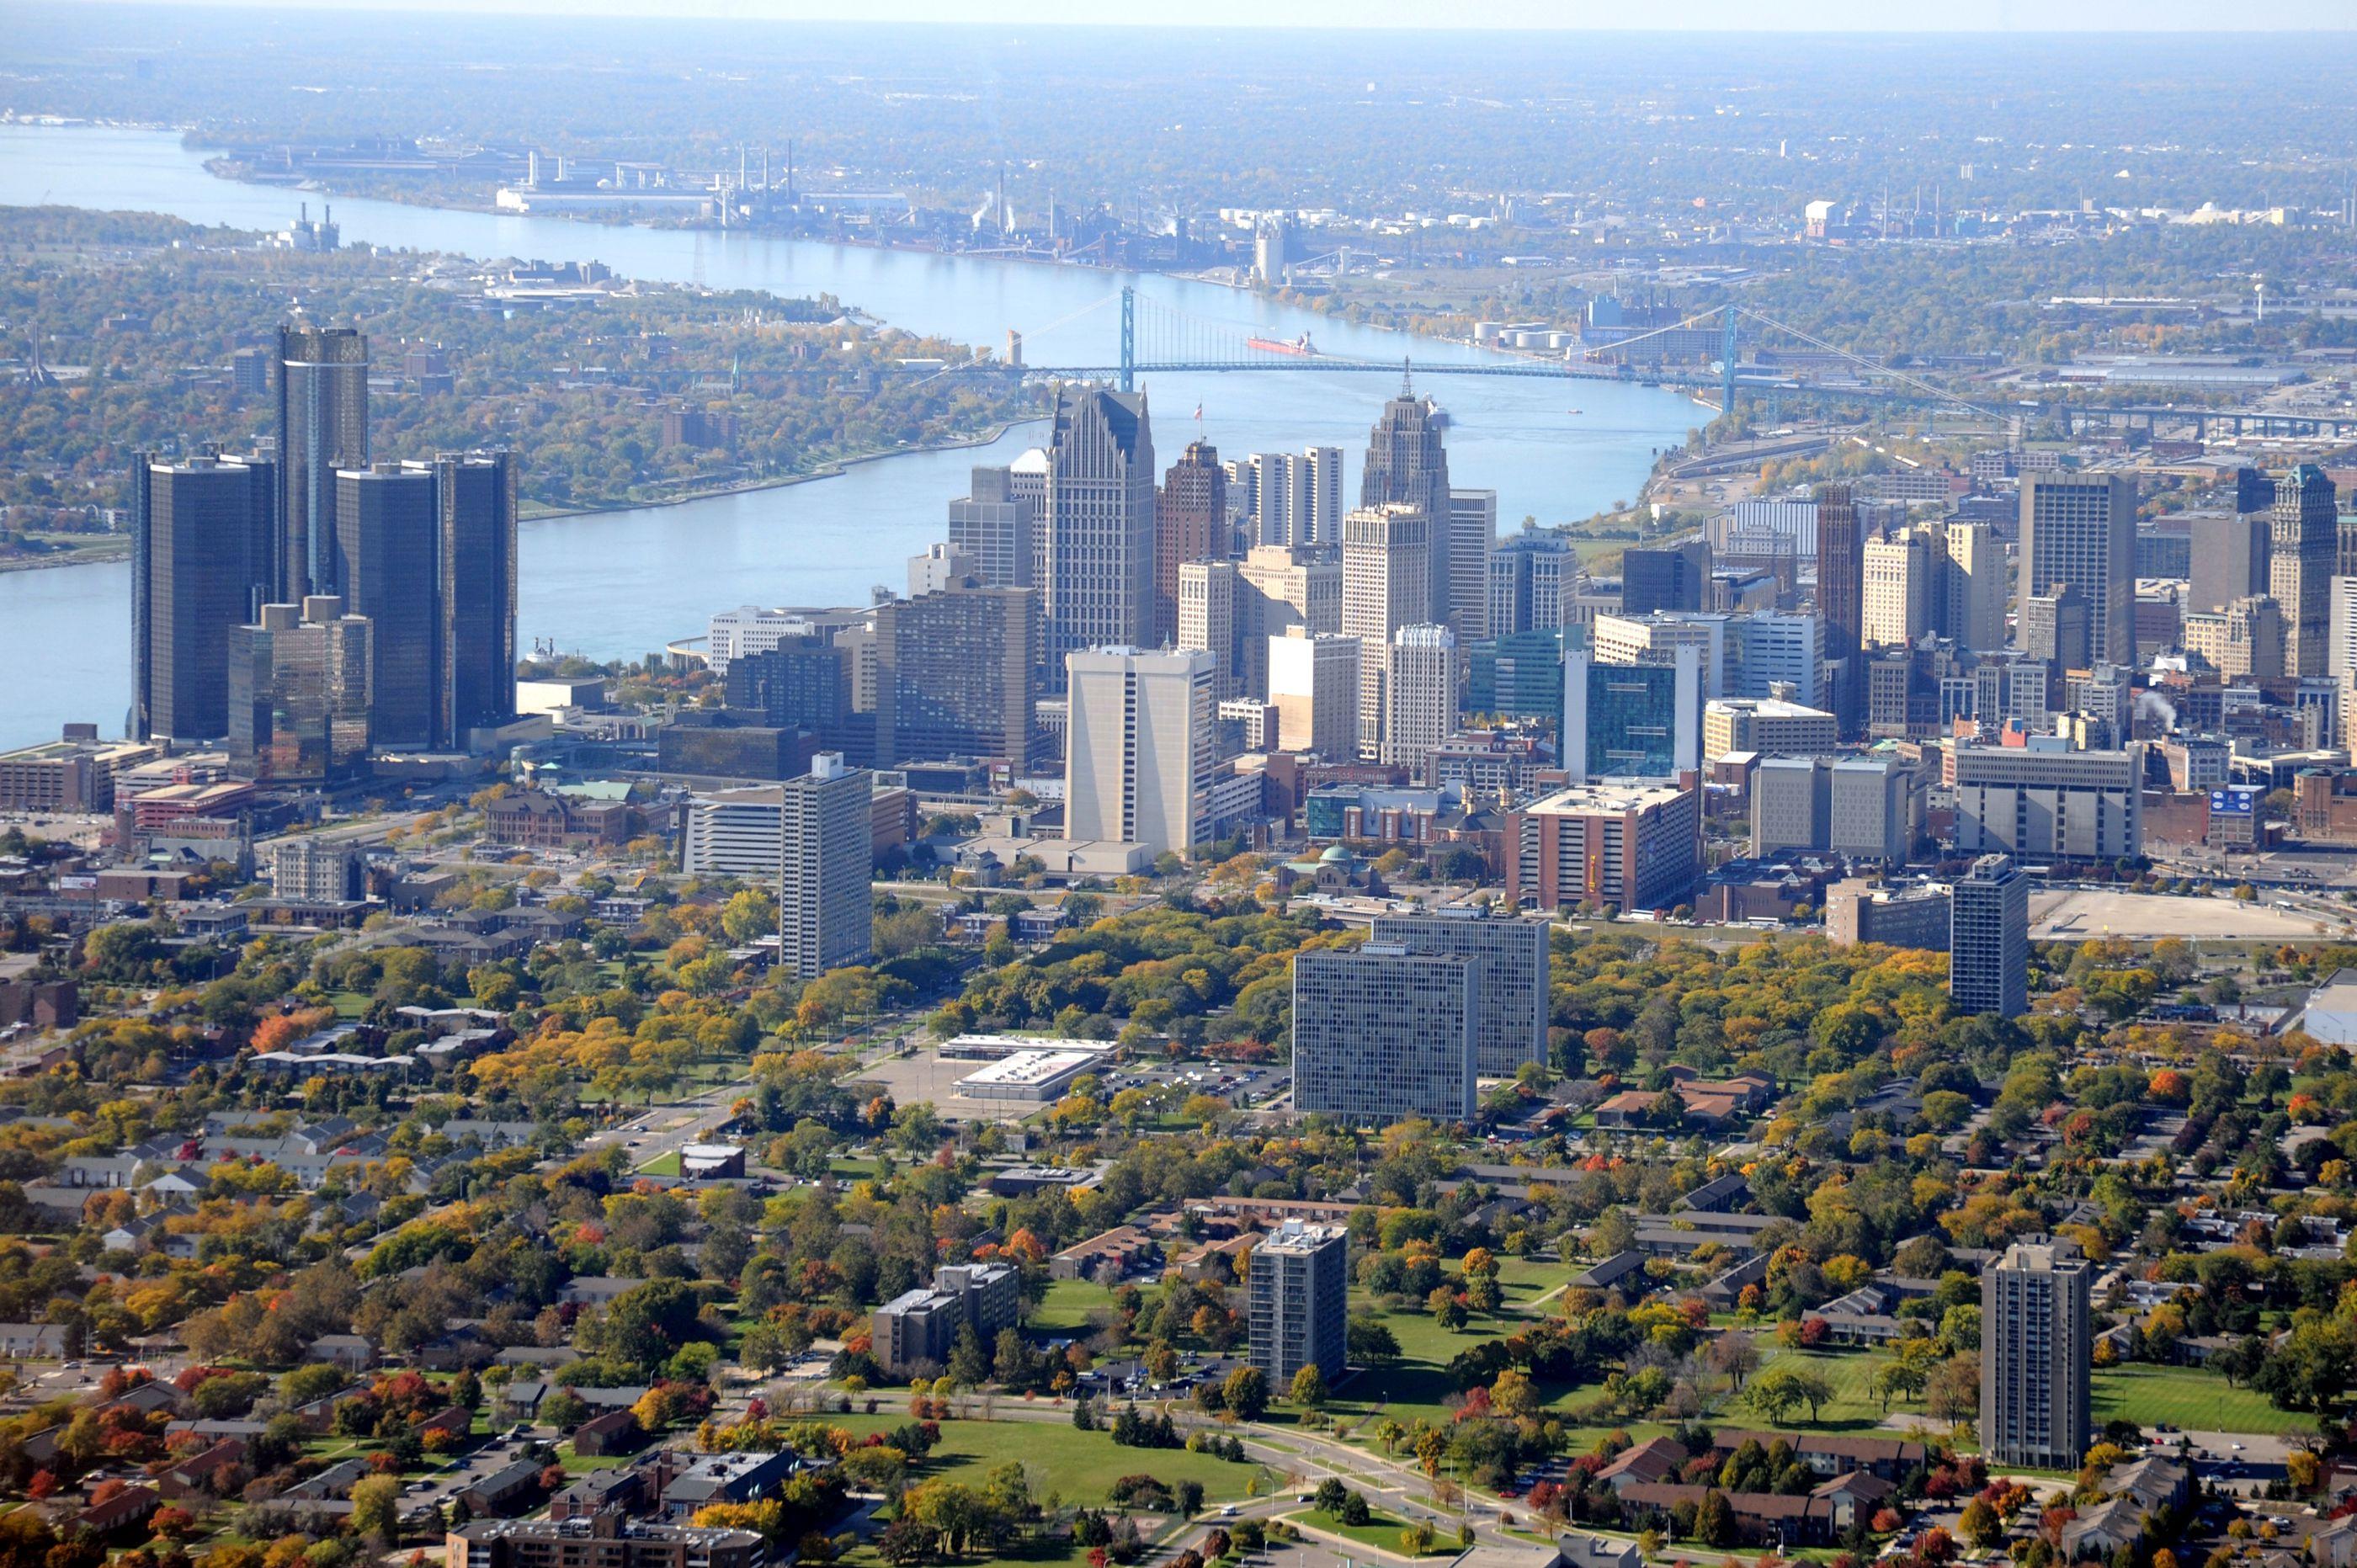 Aerial View of Detroit, Michigan USA